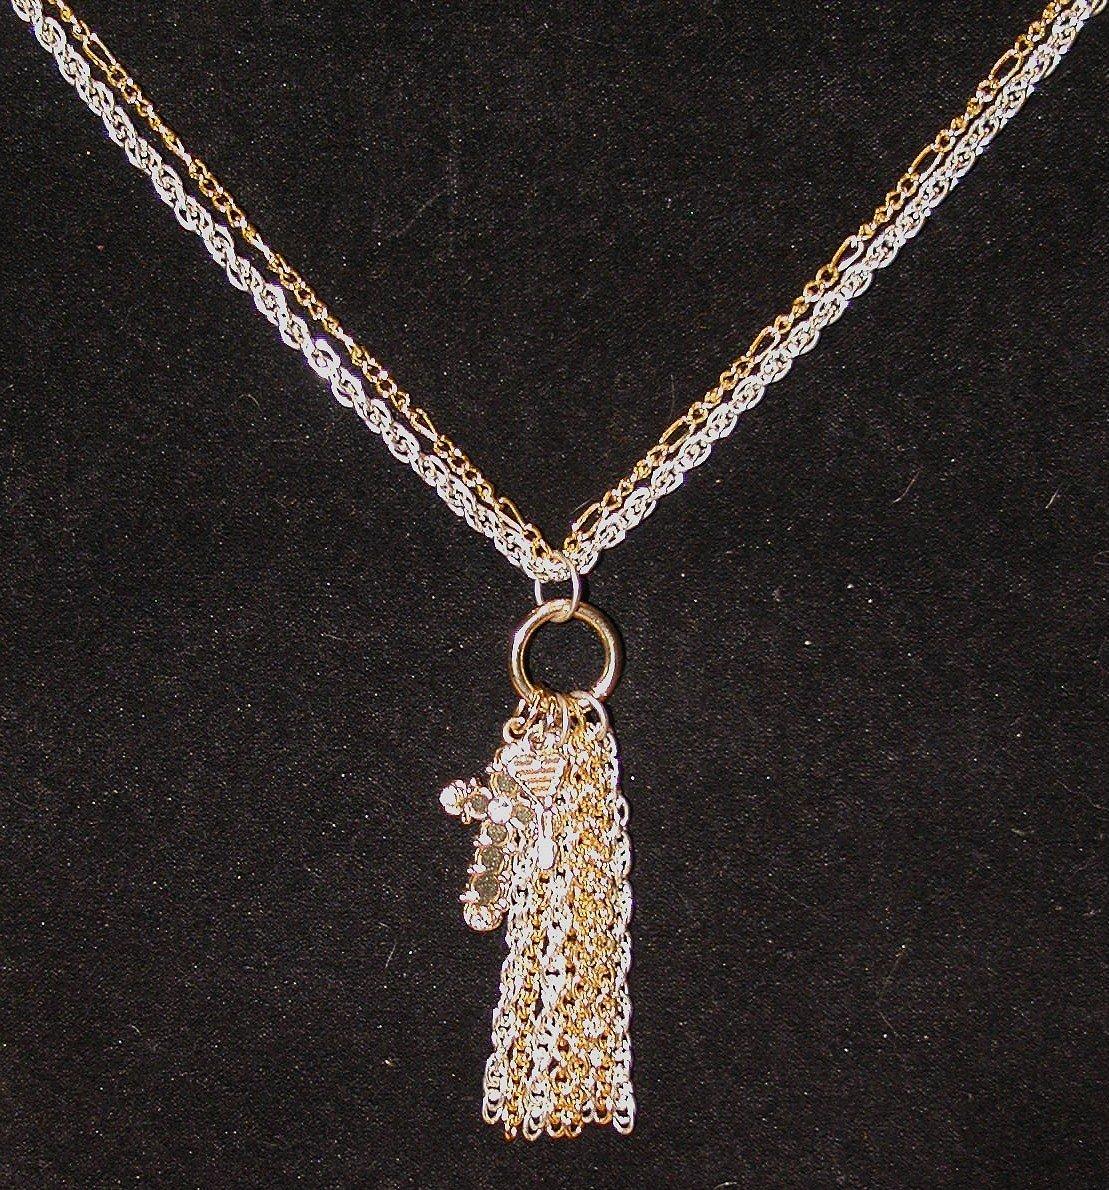 Precious Metals Necklace: Keys to the Cross